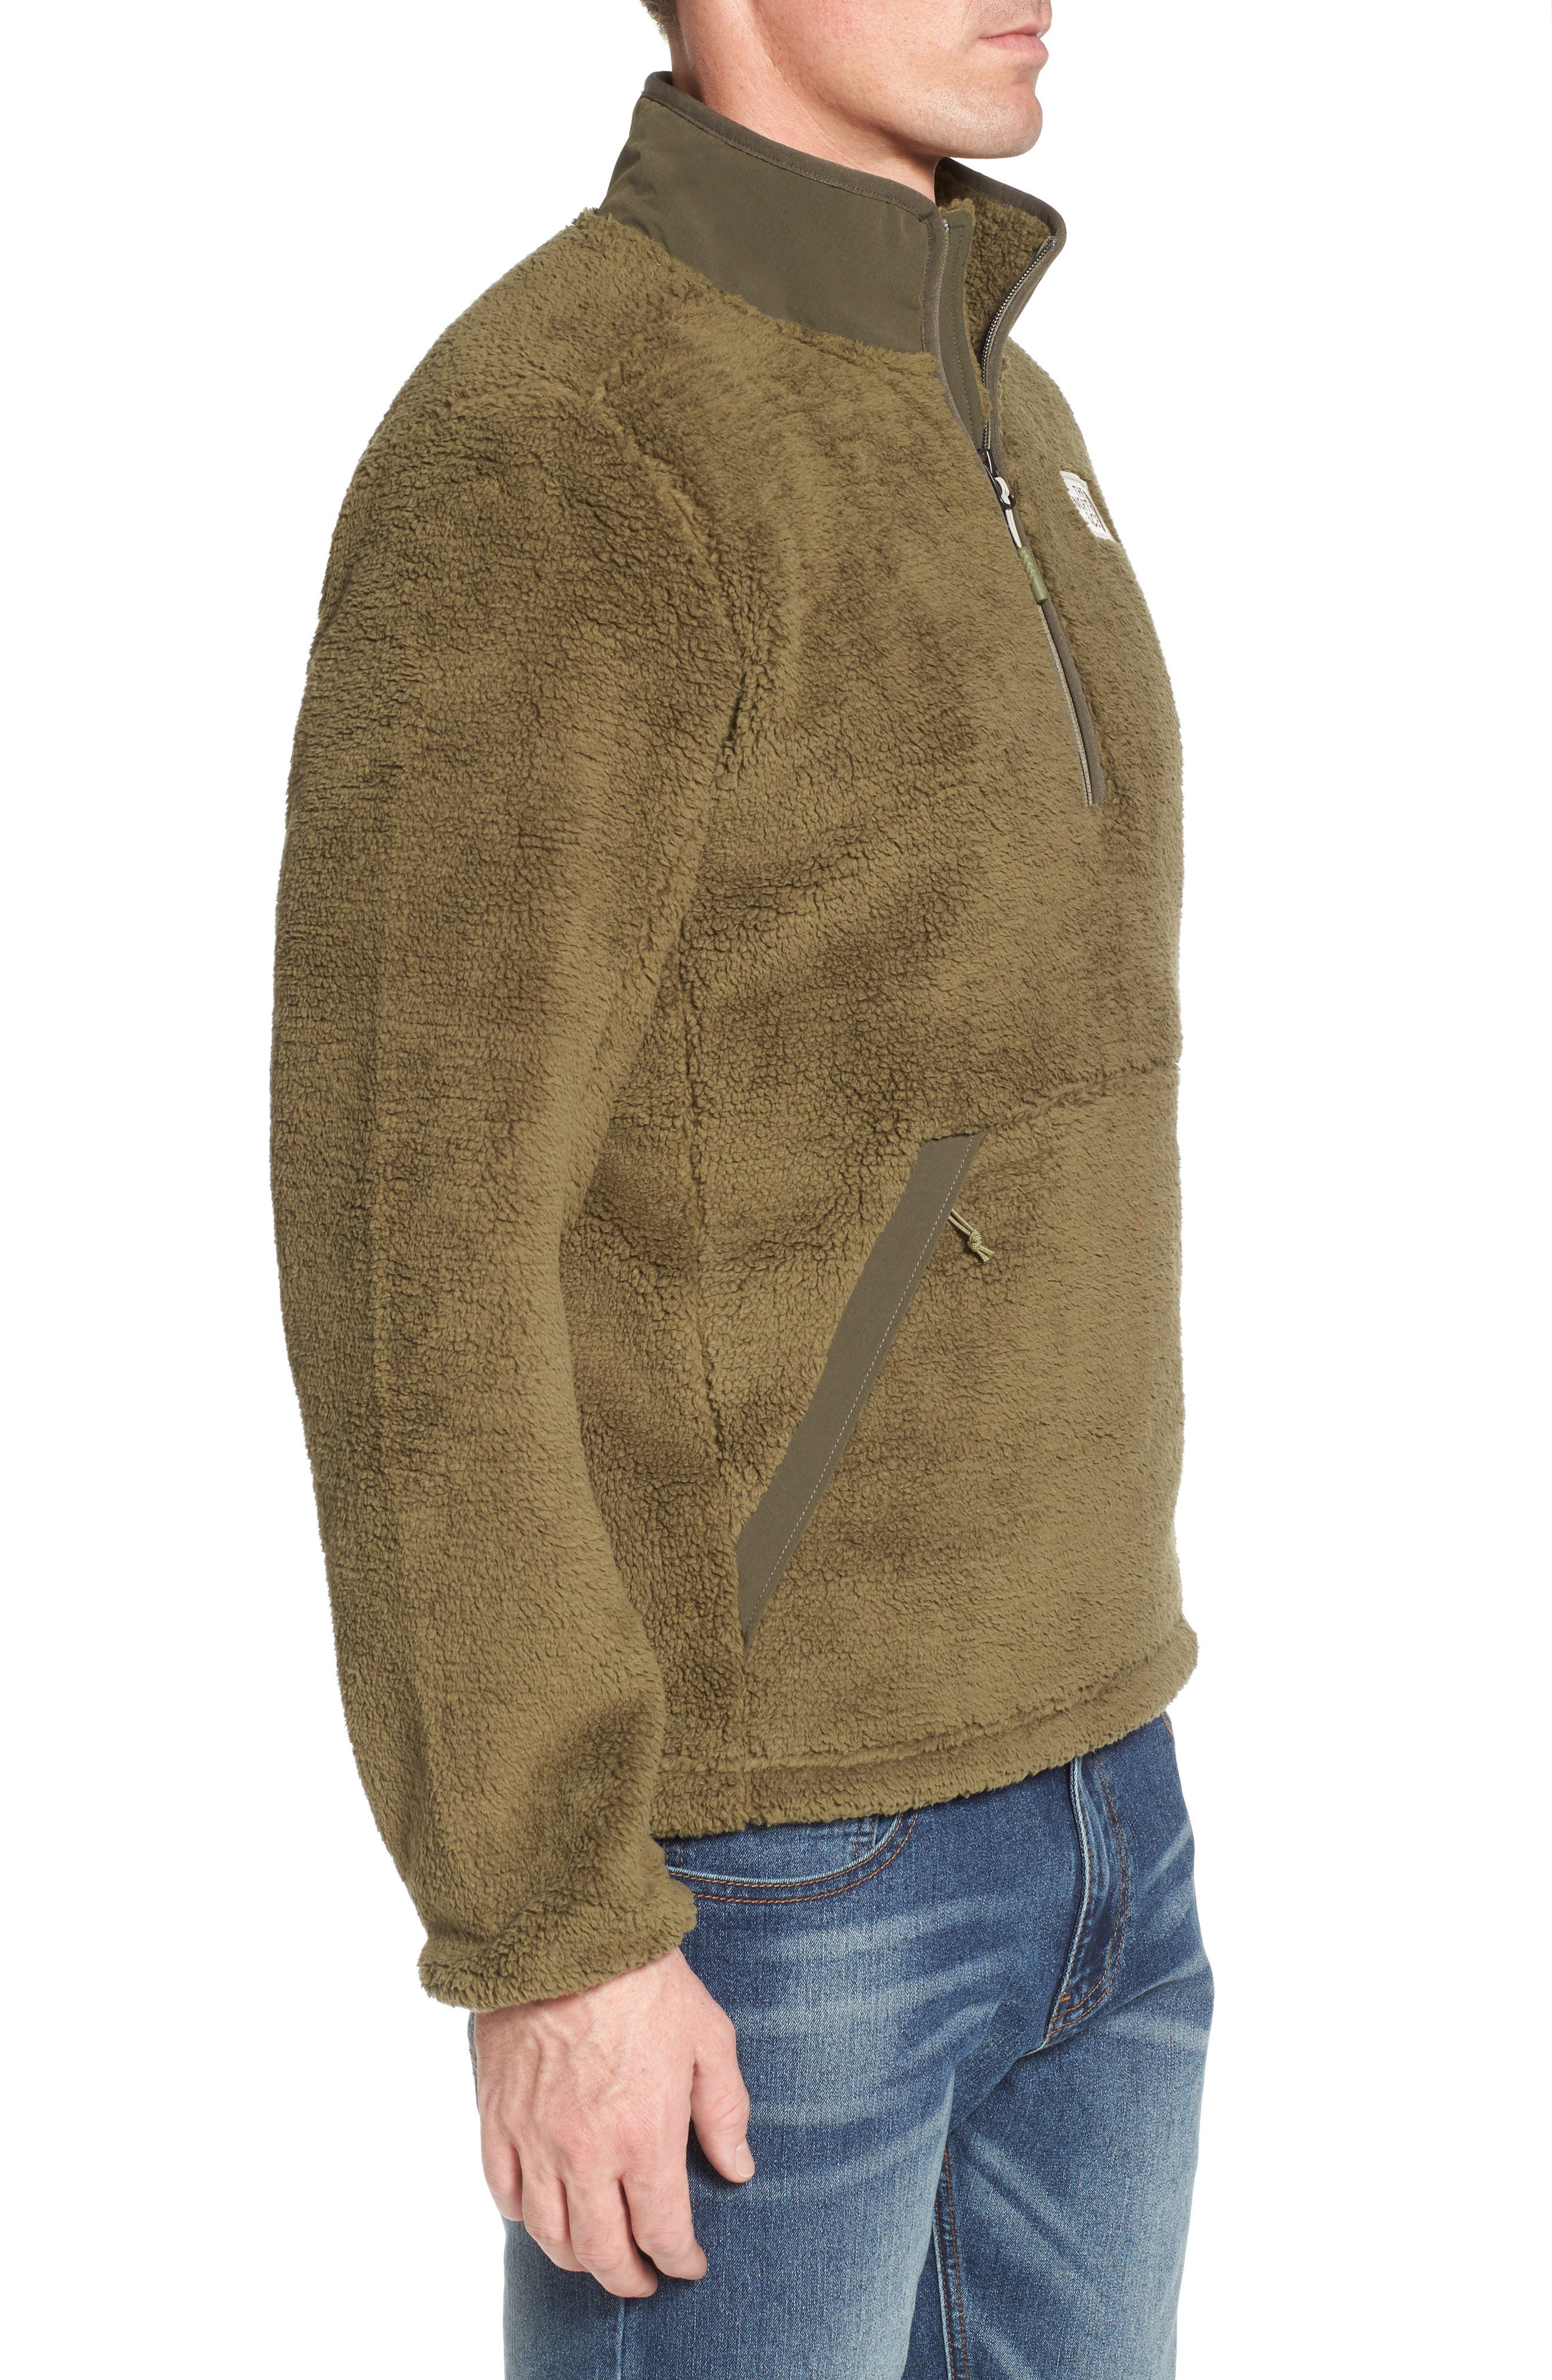 Khampfire Fleece Pullover,                             Alternate thumbnail 3, color,                             301